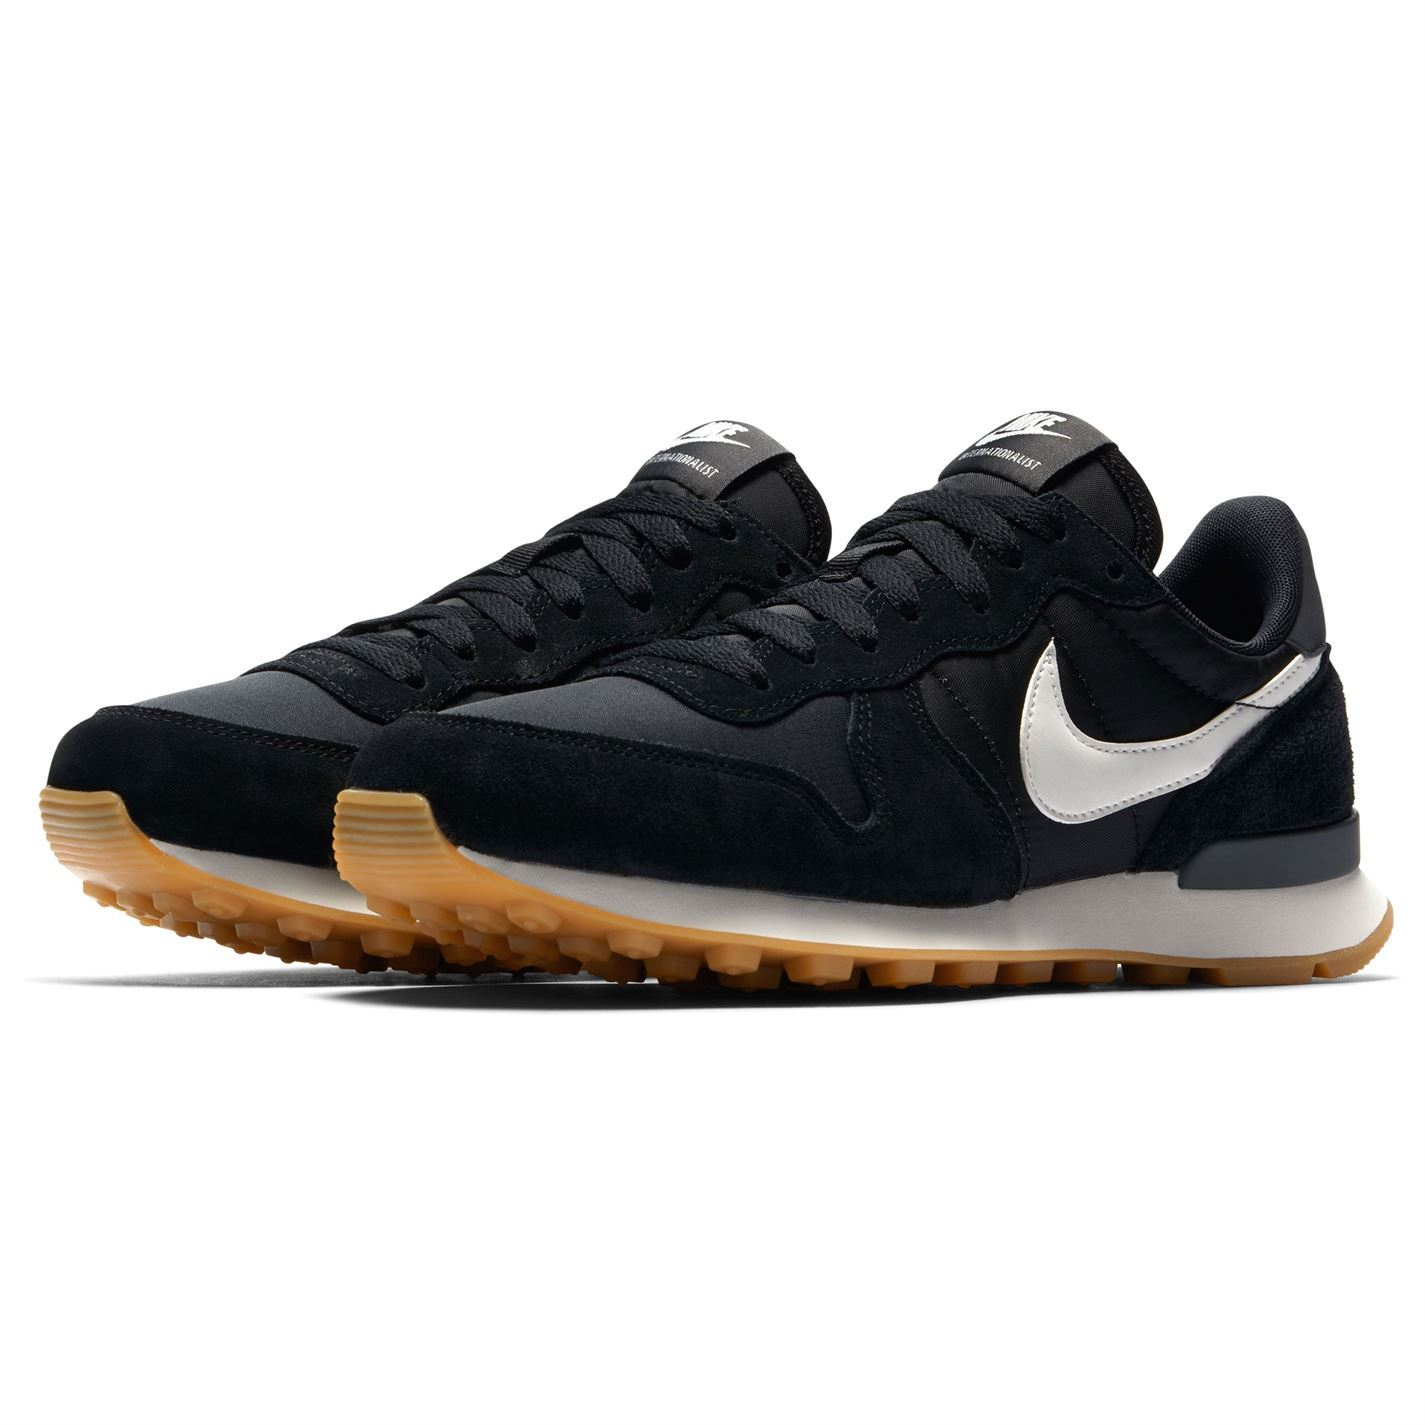 2nike international scarpe